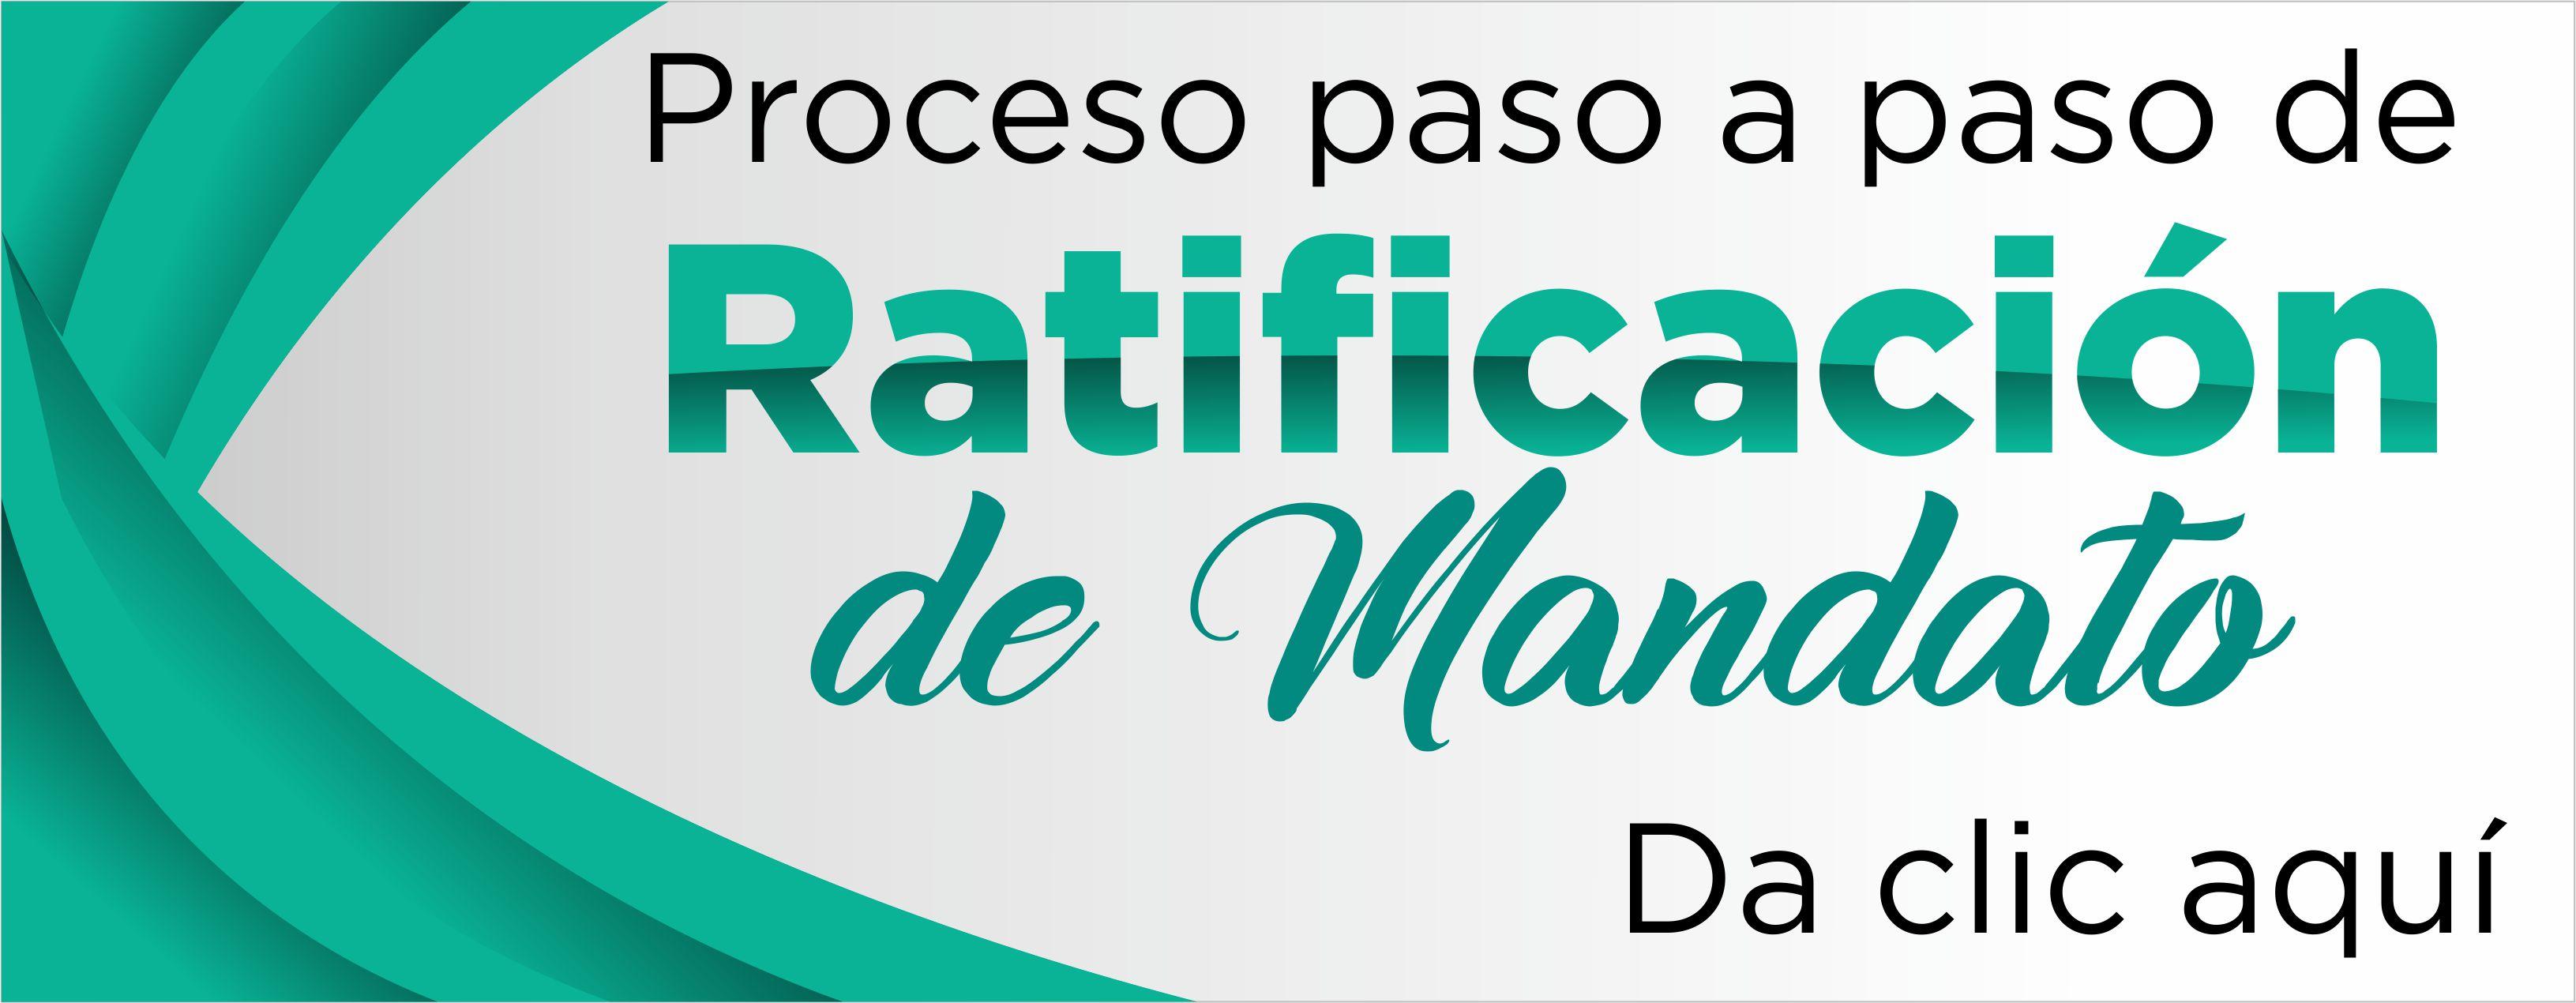 banner_ratificacion.jpg